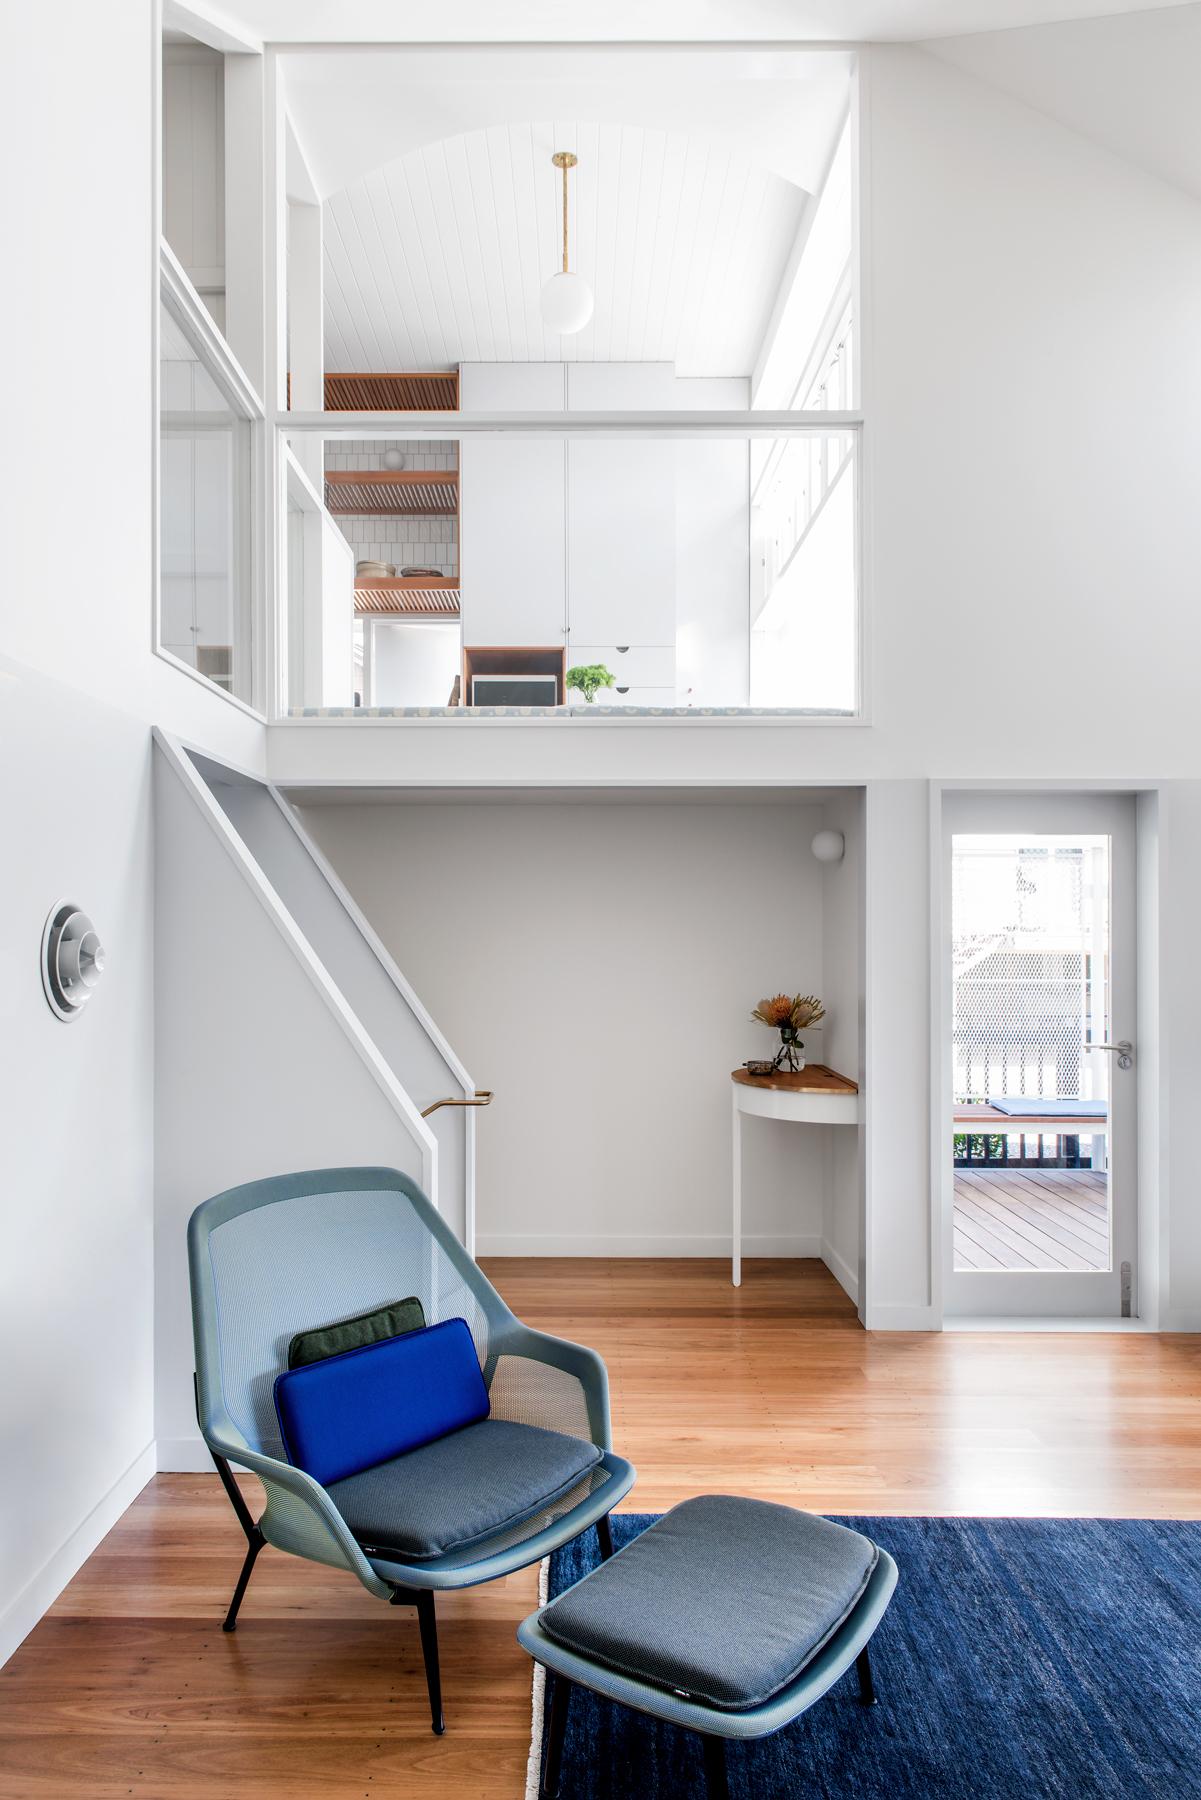 georgia-cannon-interior-designer-brisbane-rawson-house_04_S.jpg